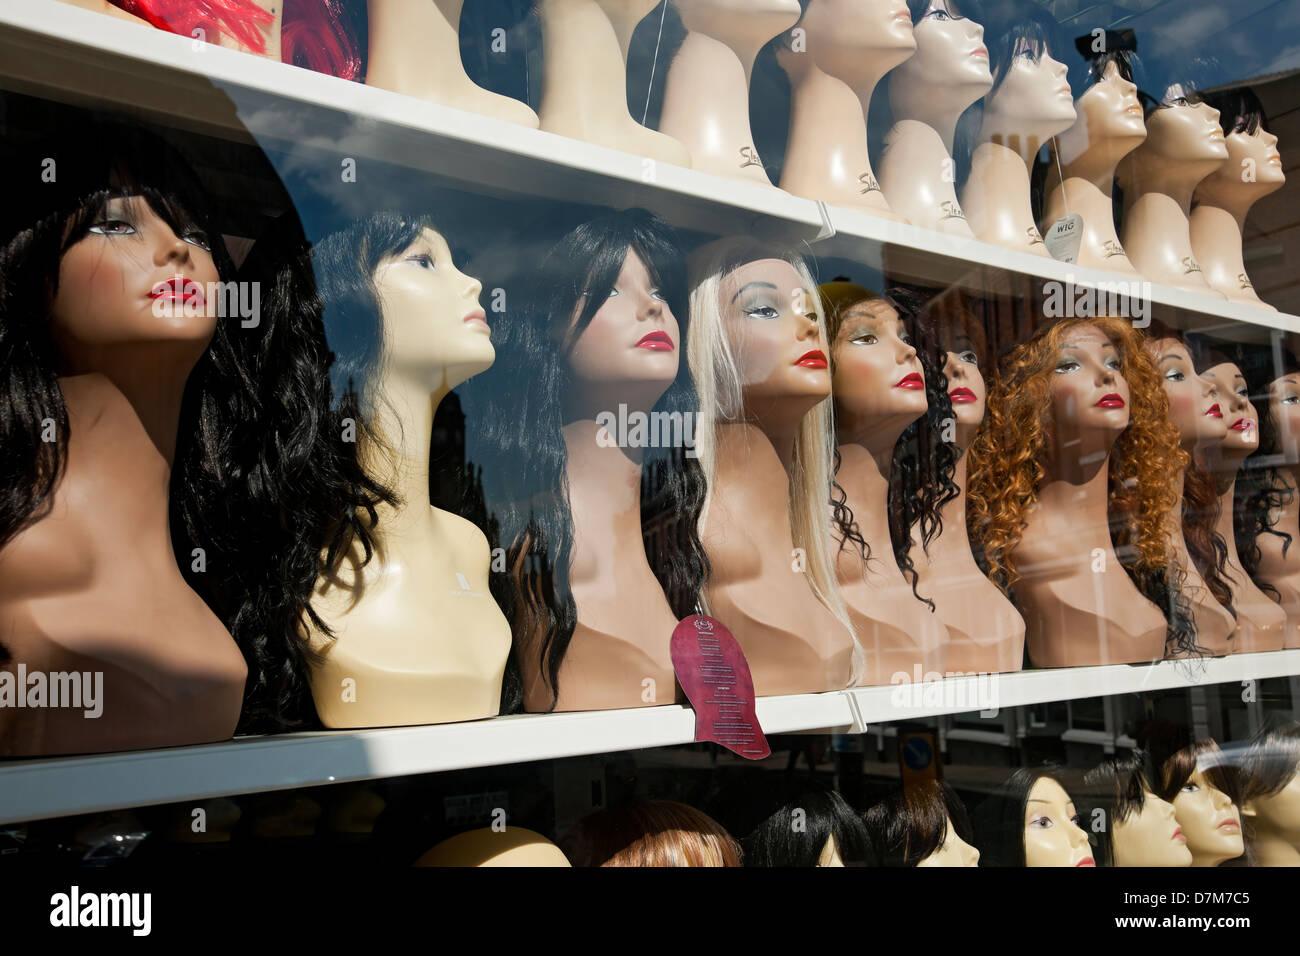 Perruques sur l'affichage en vitrine England UK Royaume-Uni GB Grande Bretagne Photo Stock